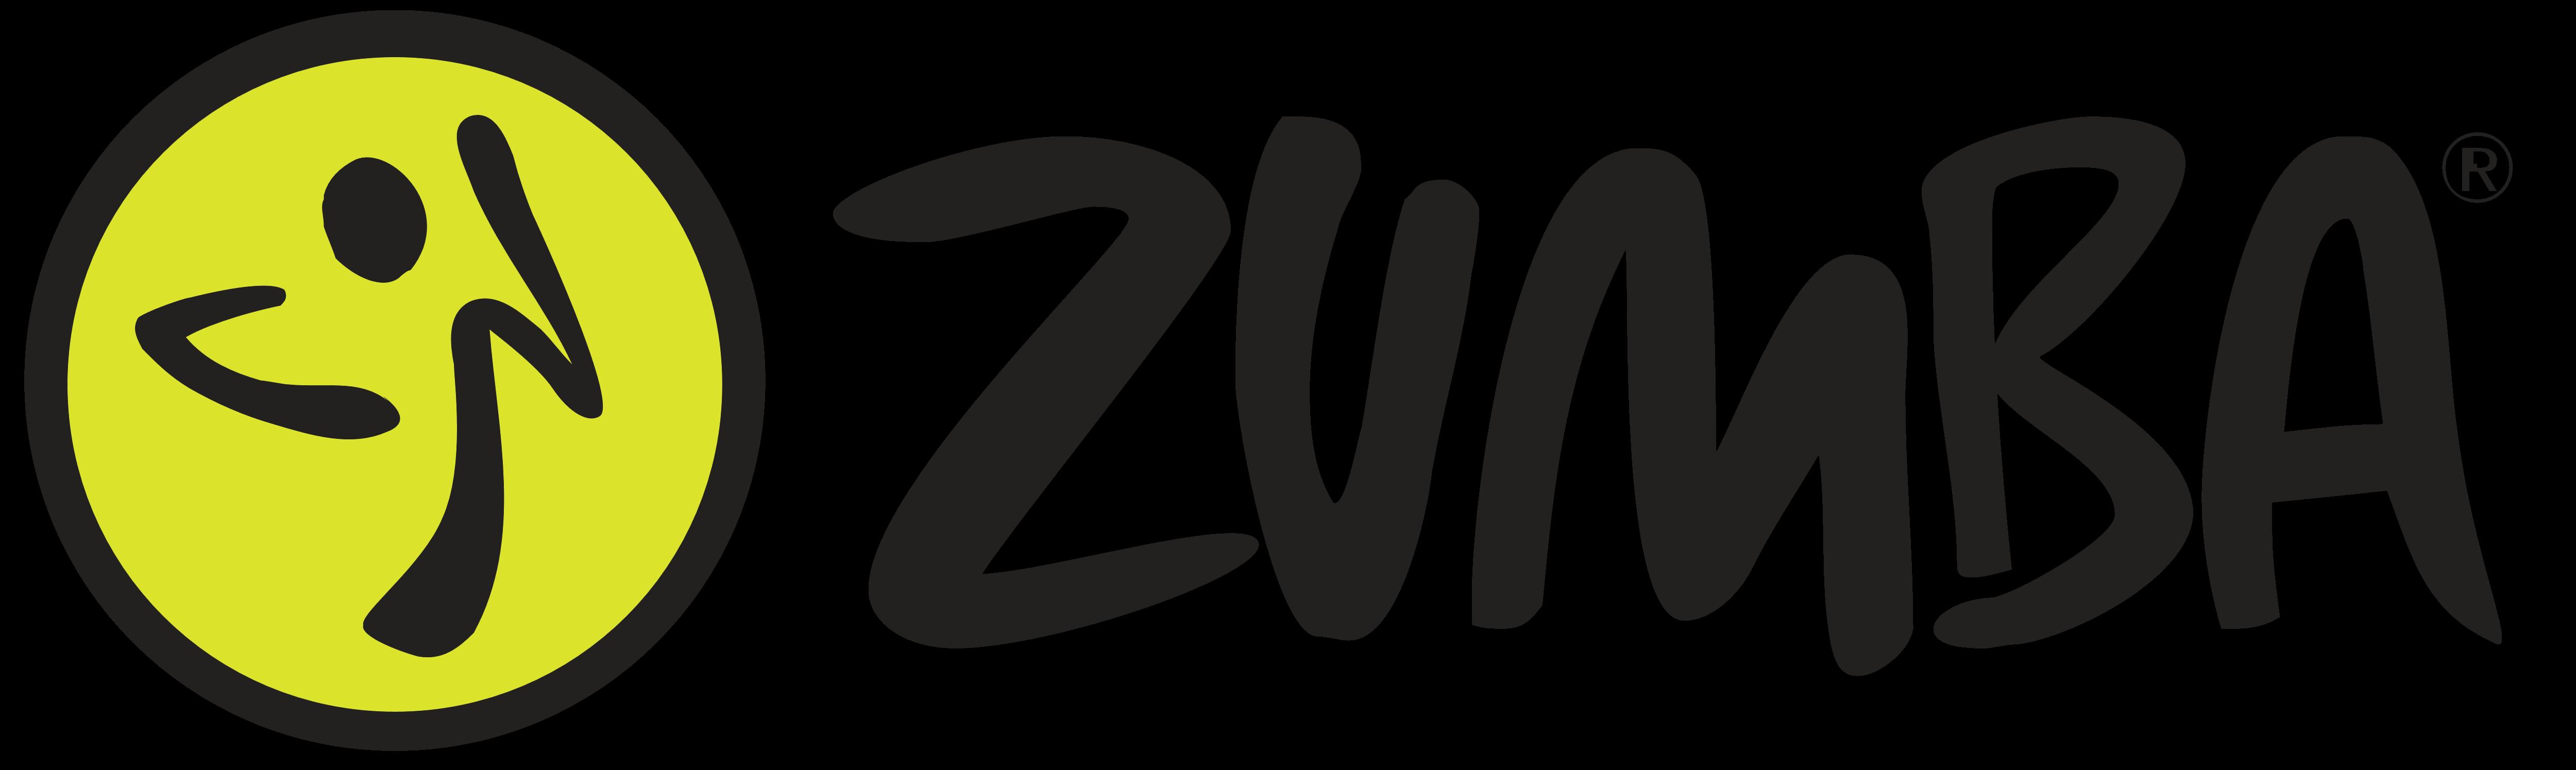 free zumba png hd transparent zumba hd png images pluspng rh pluspng com zumba logo images zumba logo images